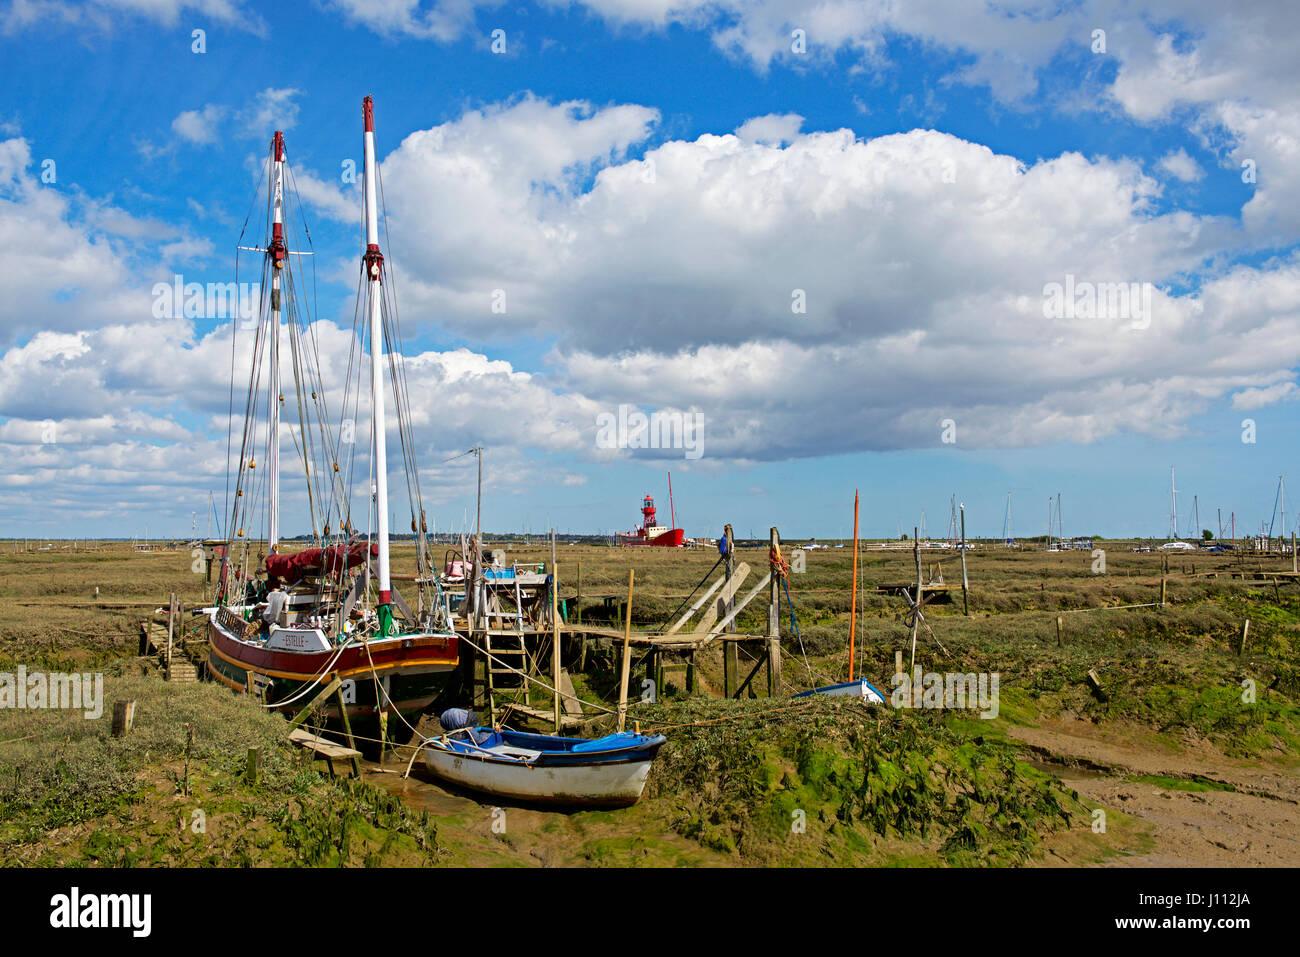 Boats on the saltmarsh, Tollesbury, Essex, England UK Stock Photo